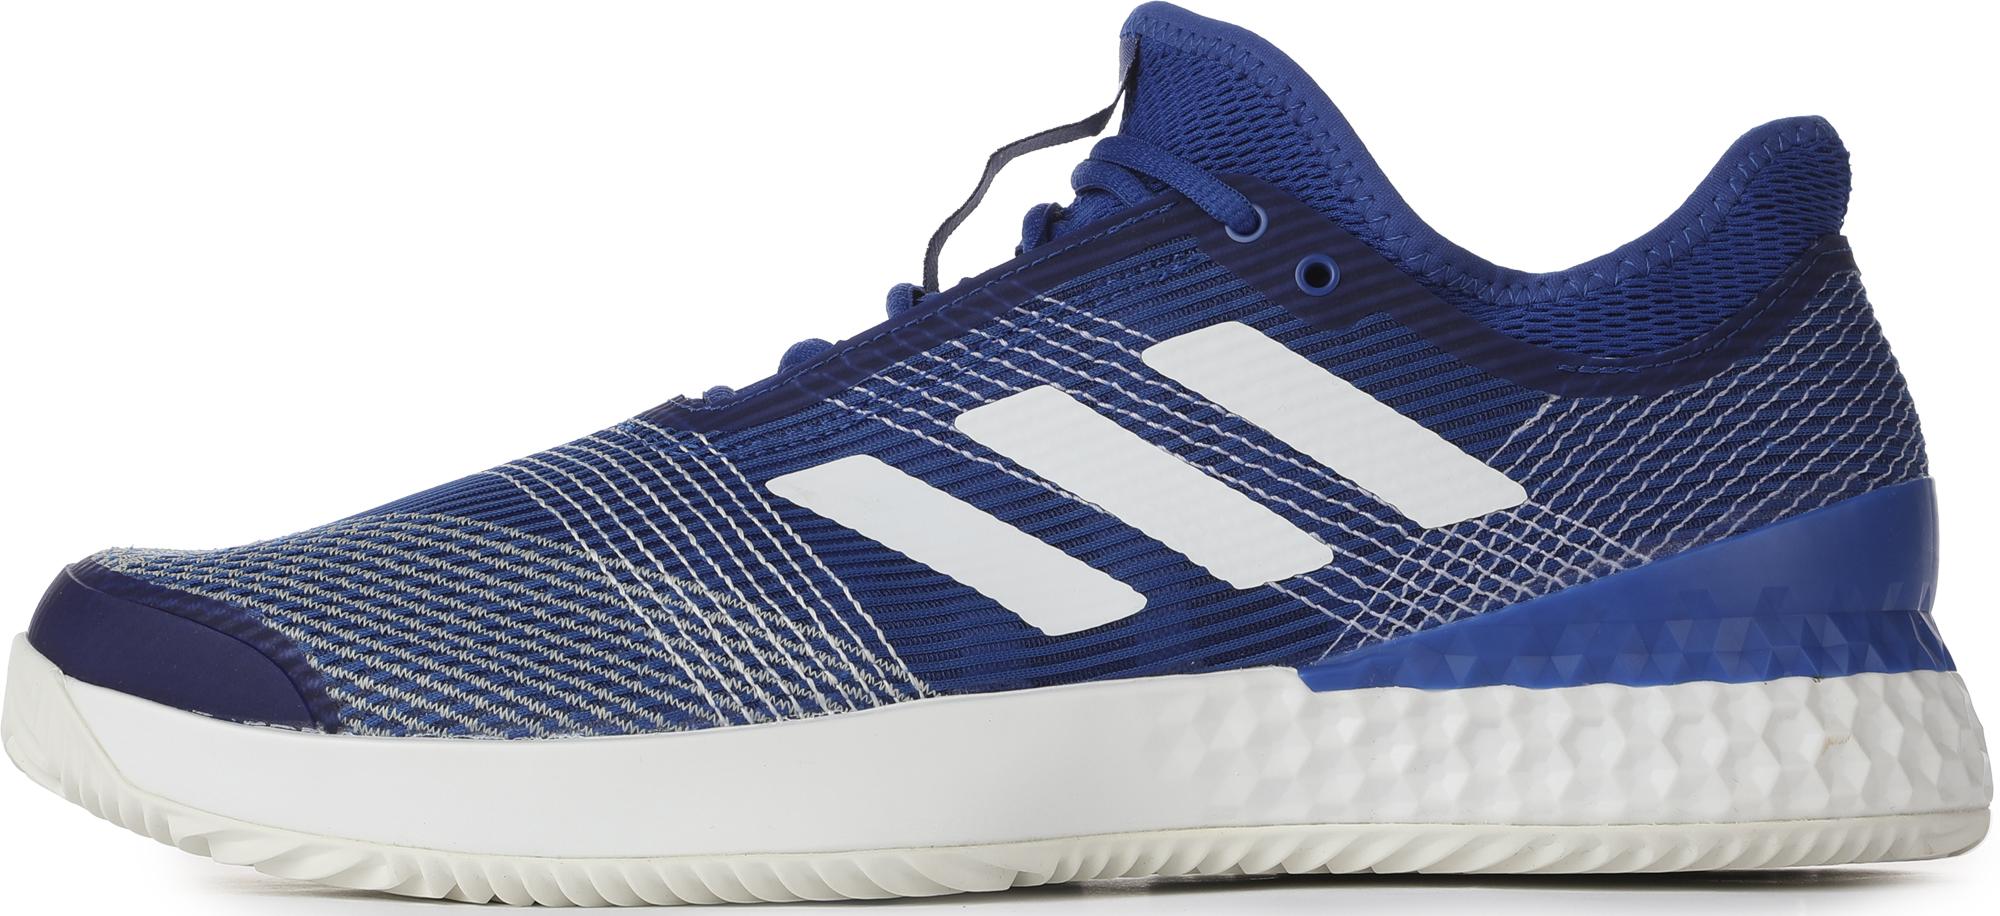 Adidas Кроссовки мужские Adidas Adizero Ubersonic 3, размер 40